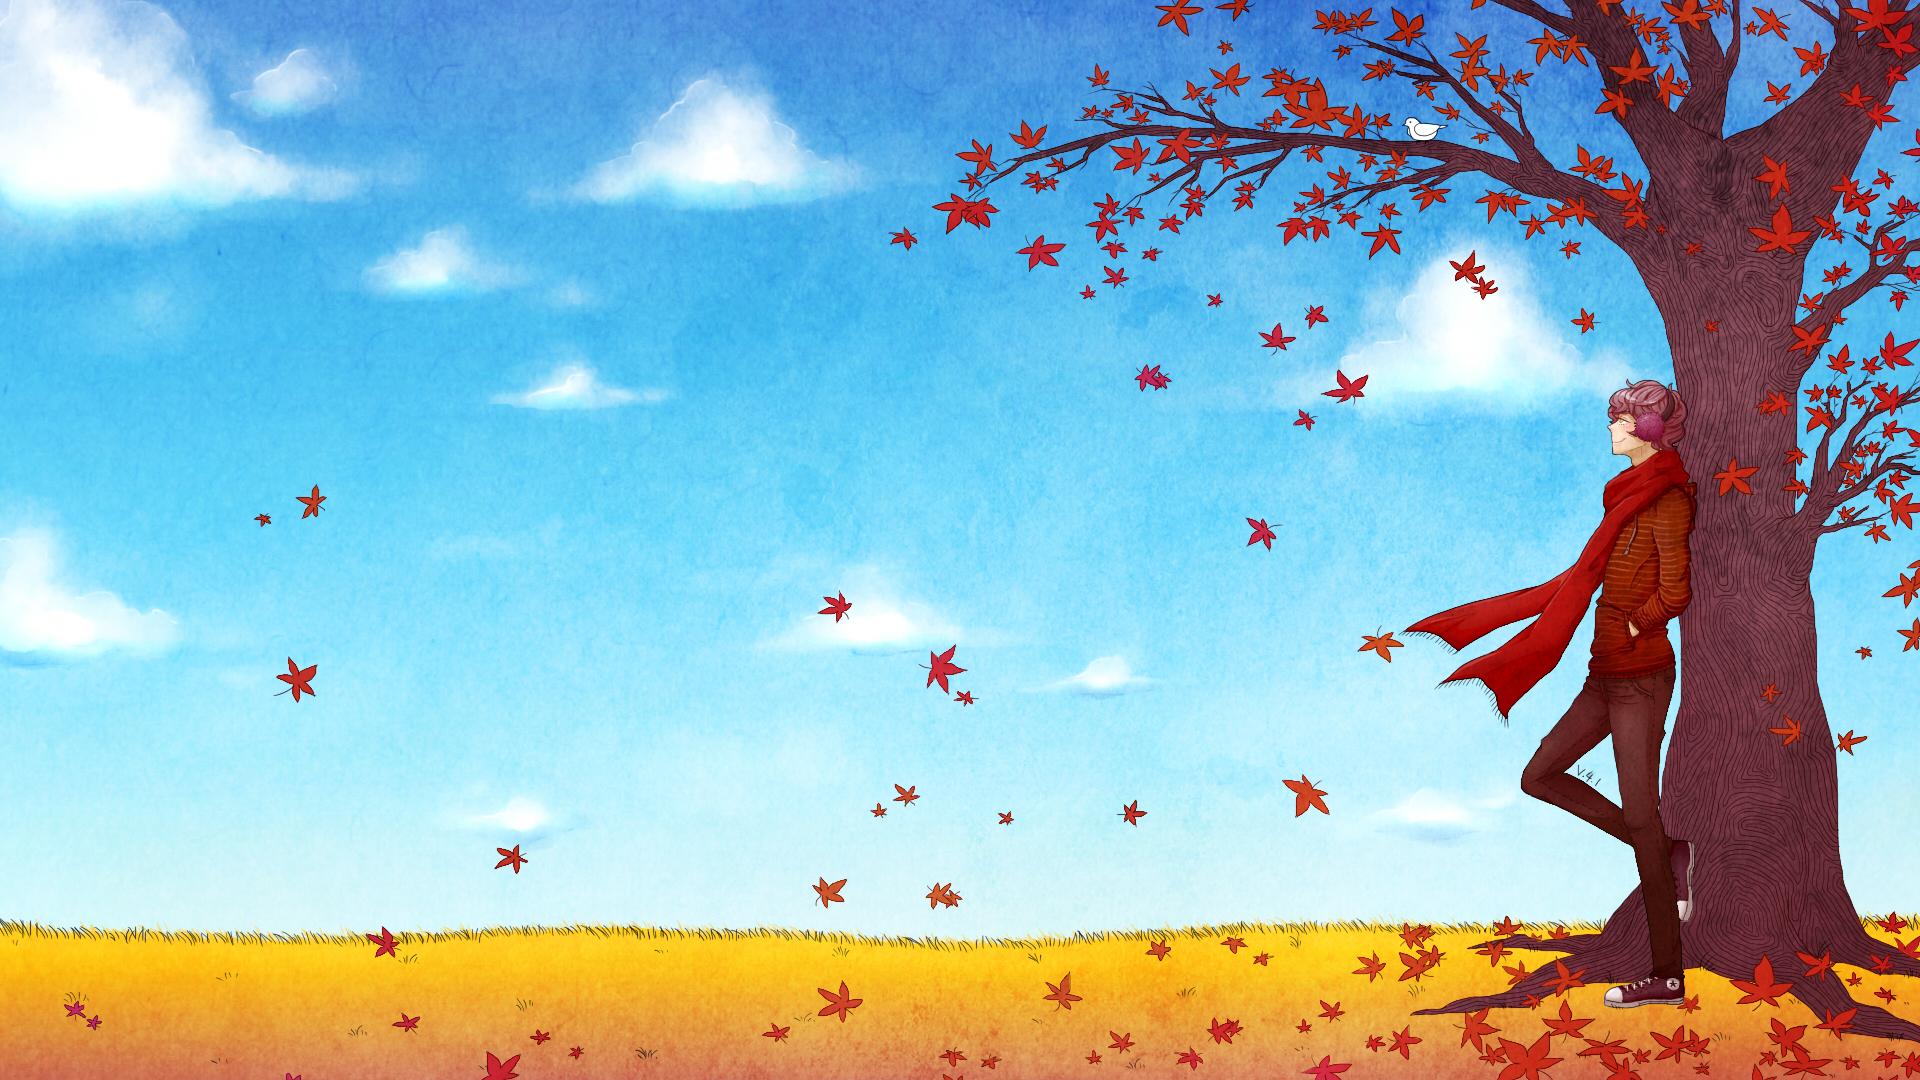 v4 1colour desktop background fall theme by shyhl3